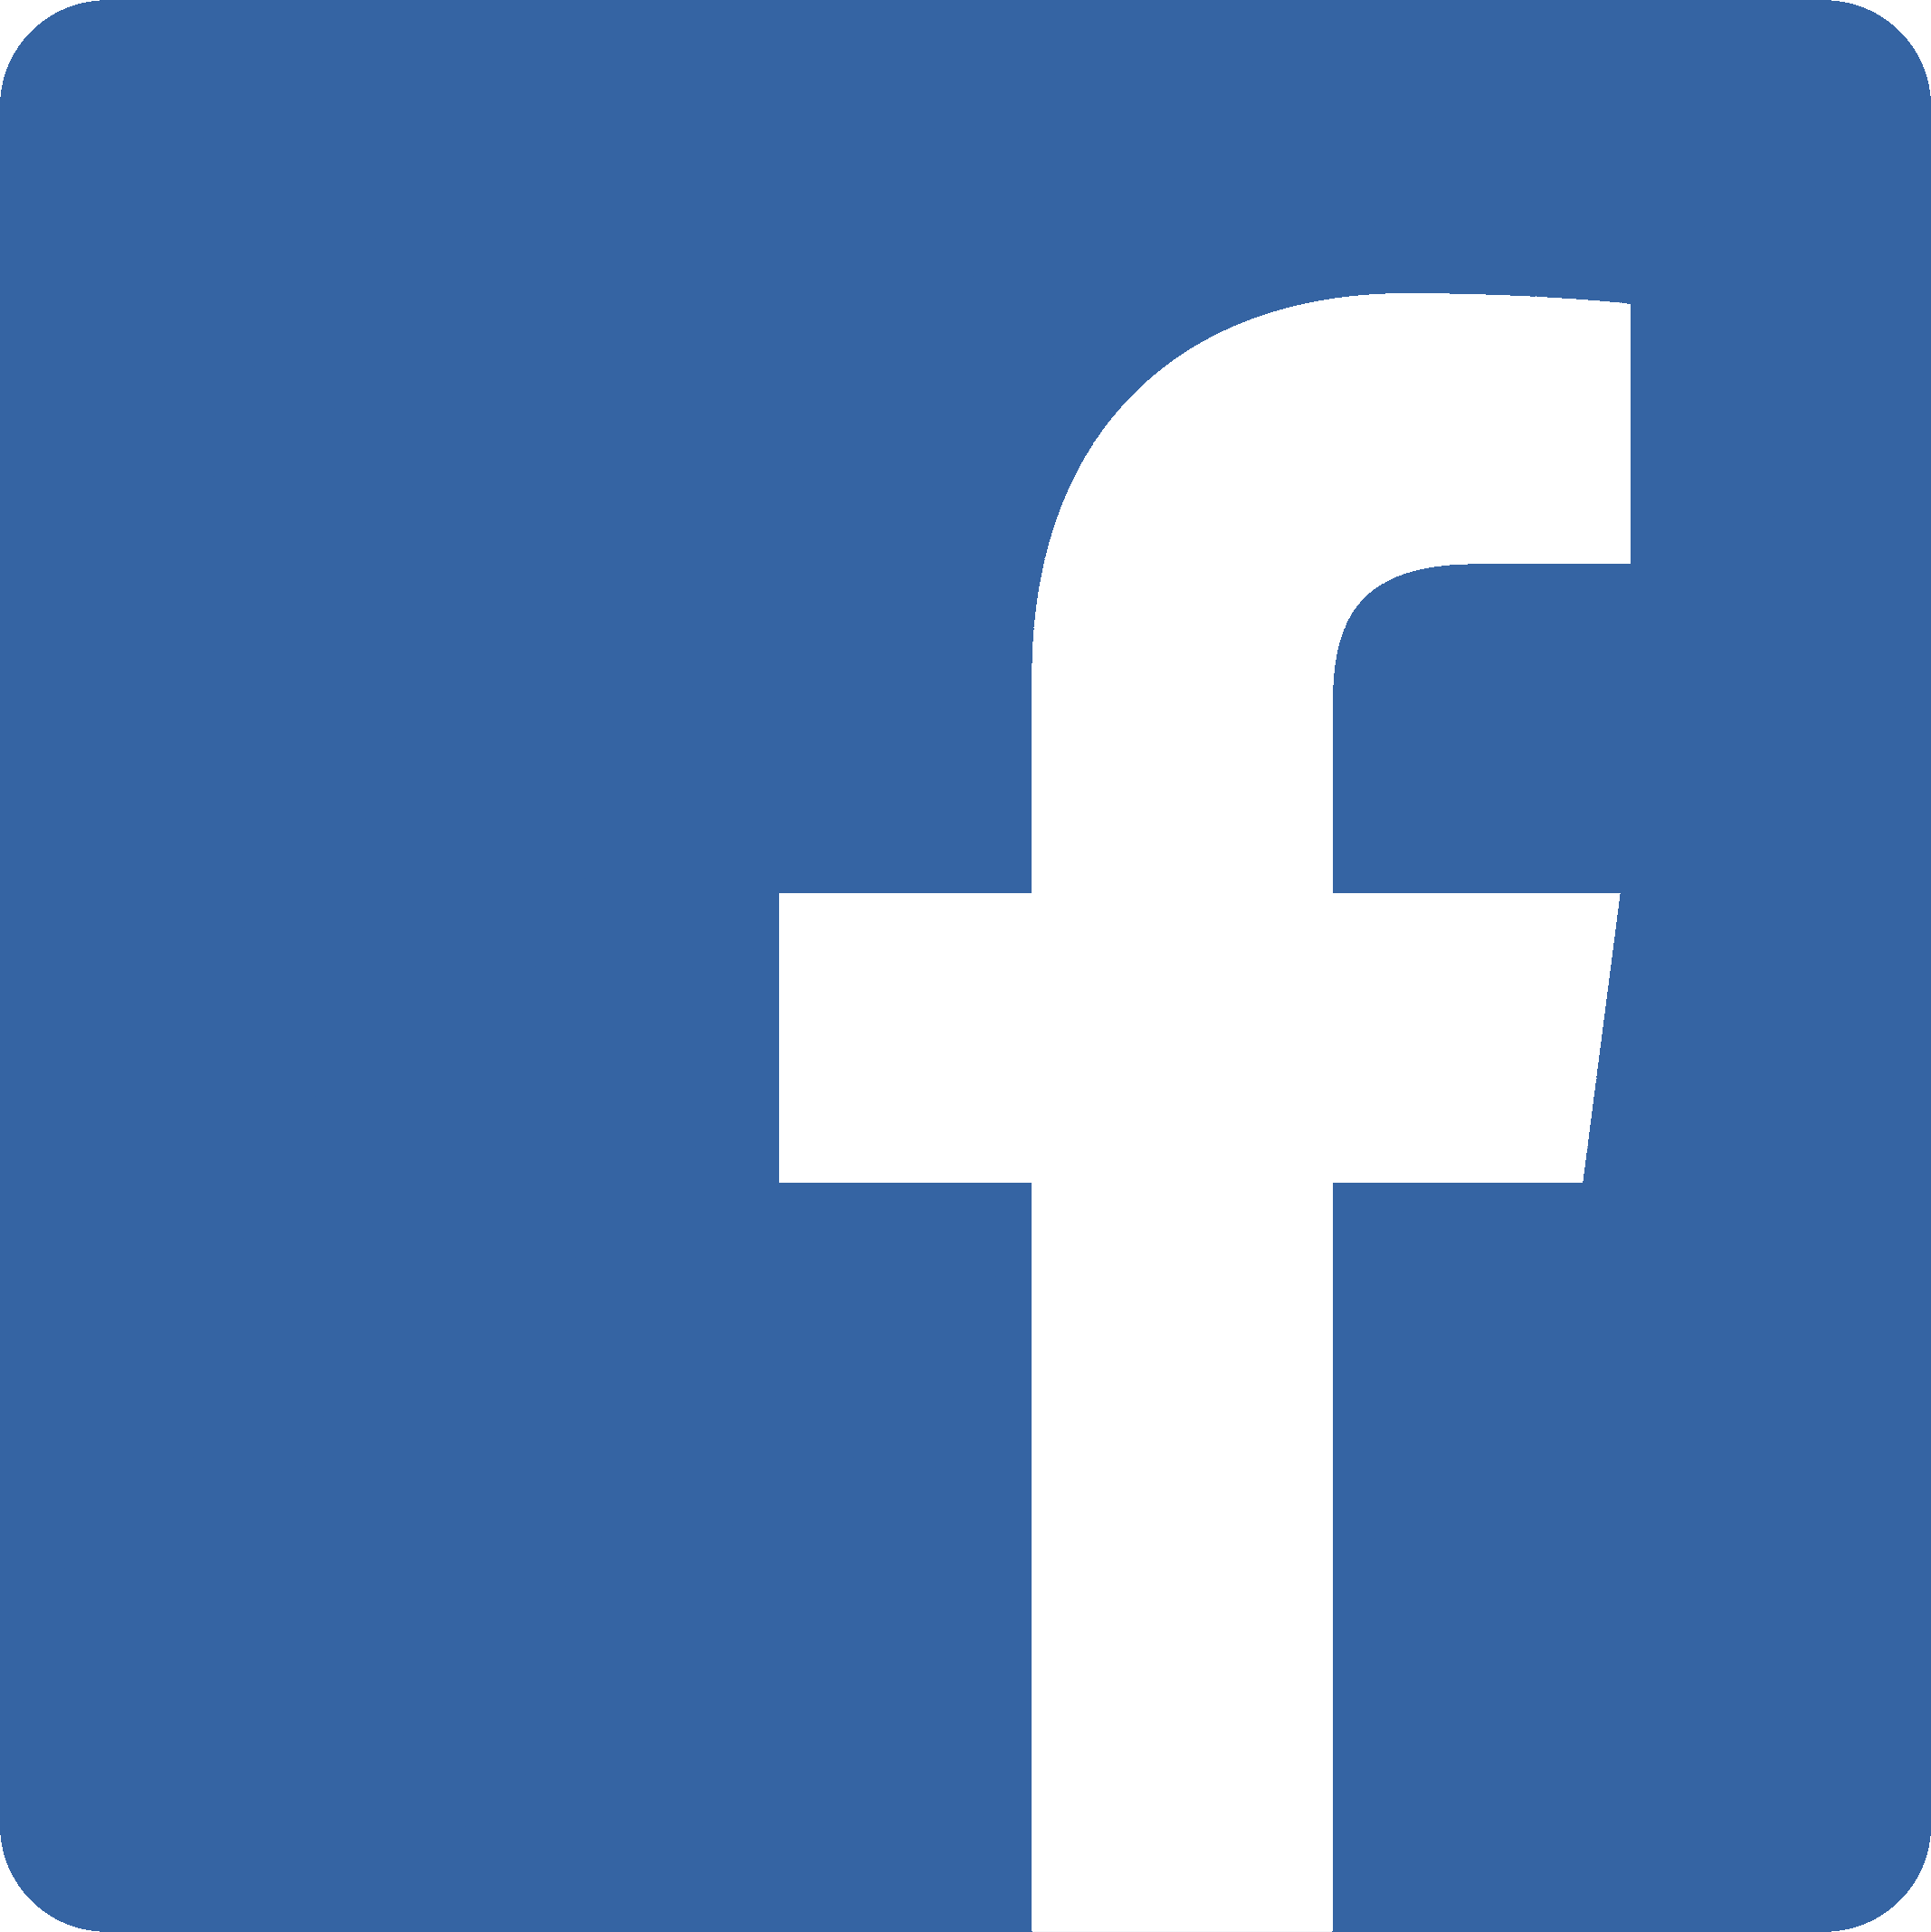 fb facebook logo blue social media mydietgoal